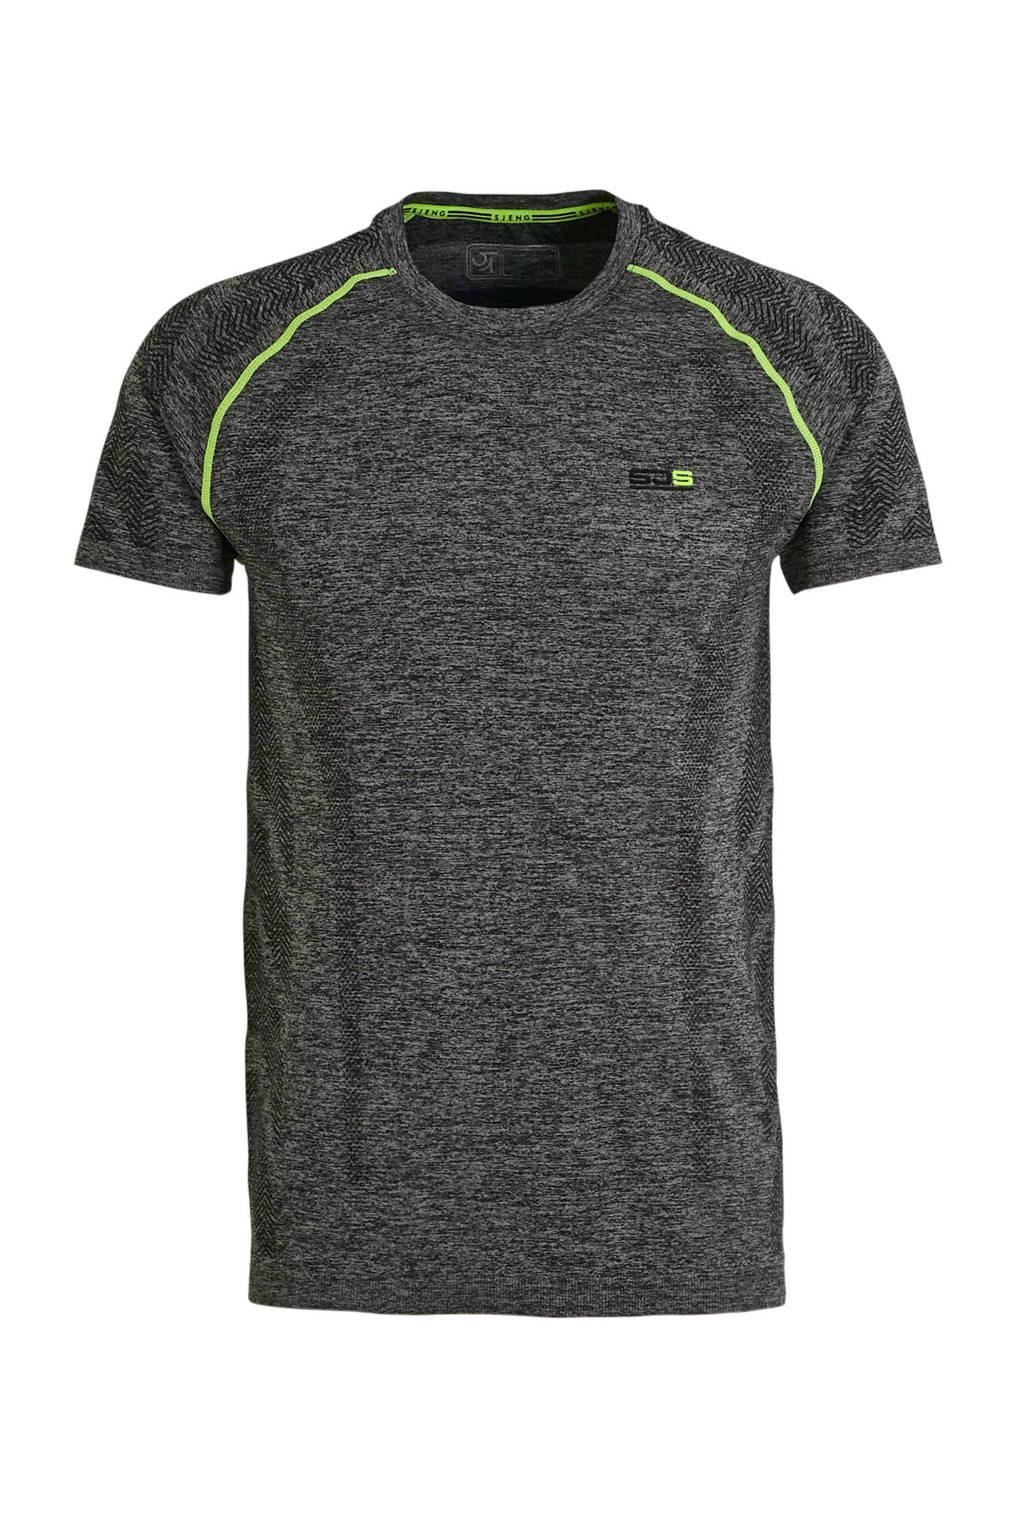 Sjeng Sports   T-shirt Marcello grijs melange, Grijs melange